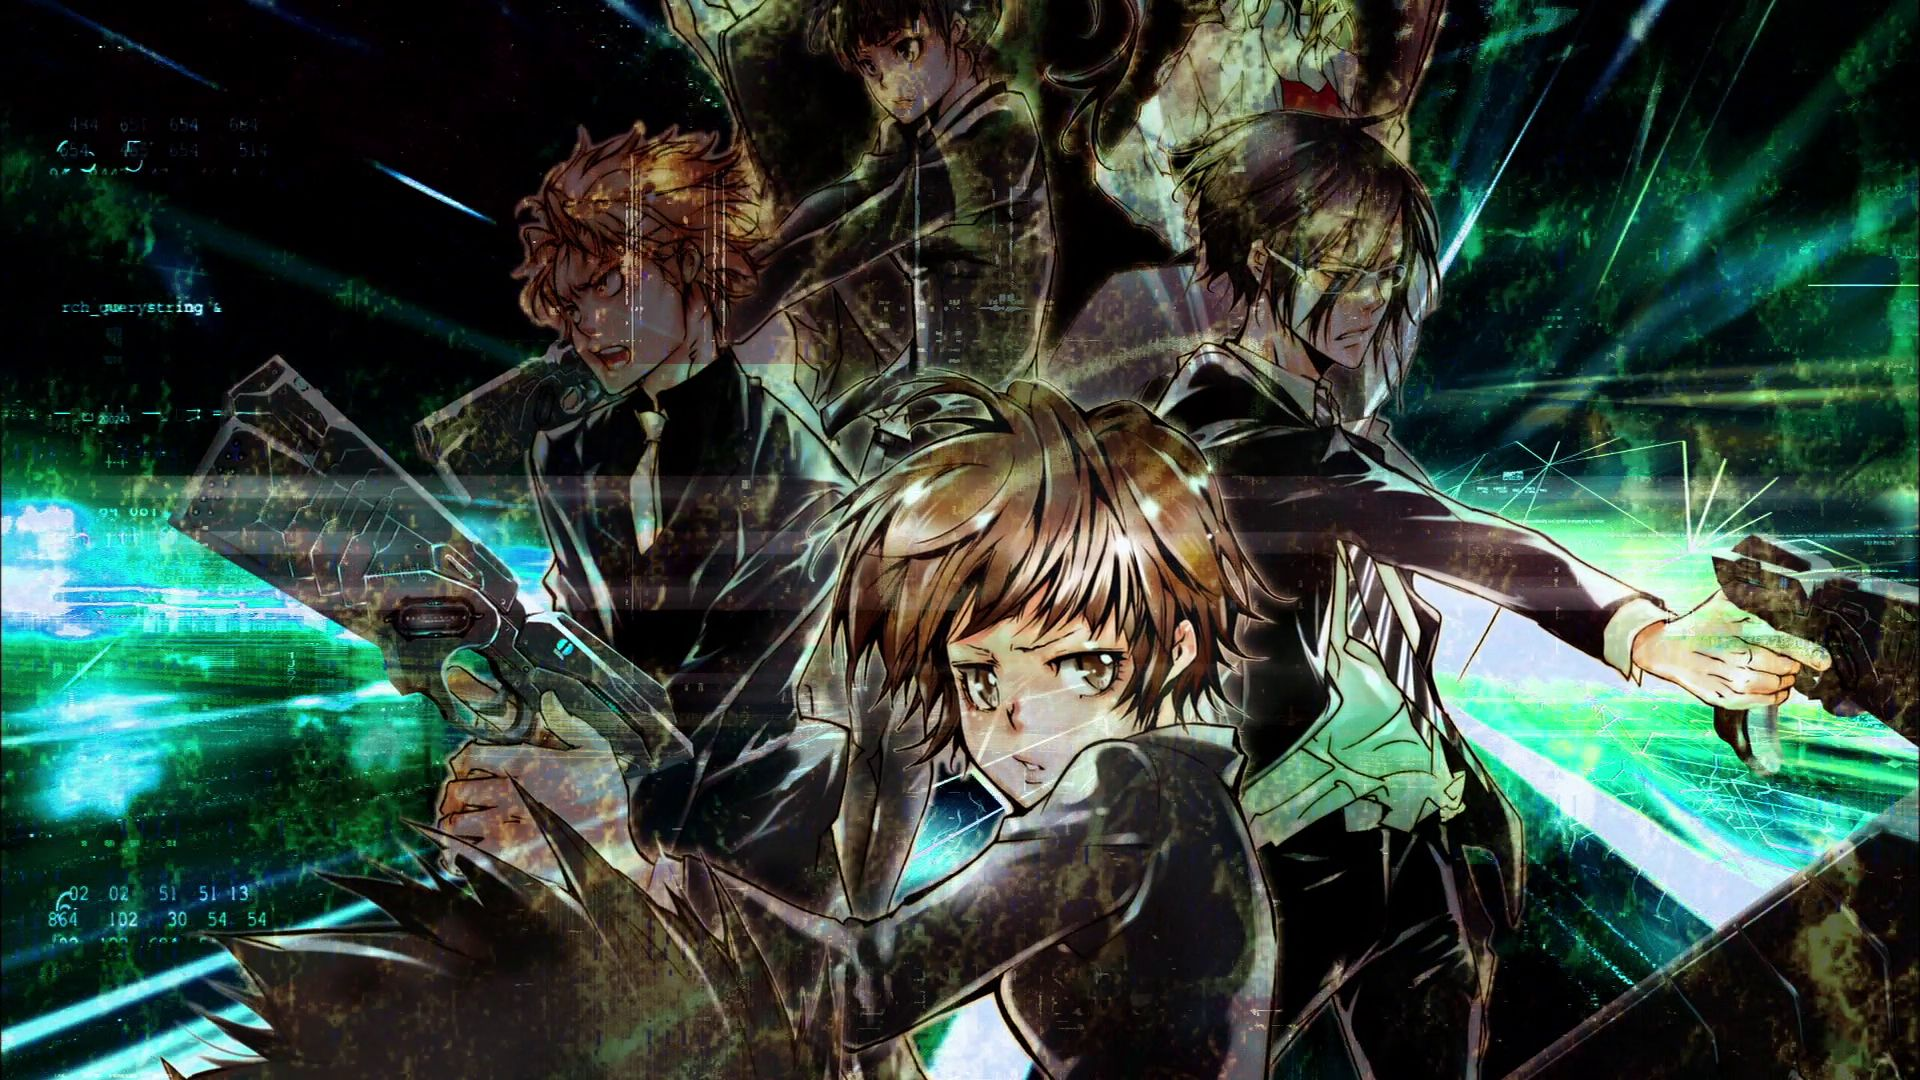 Psycho Pass wallpaper image